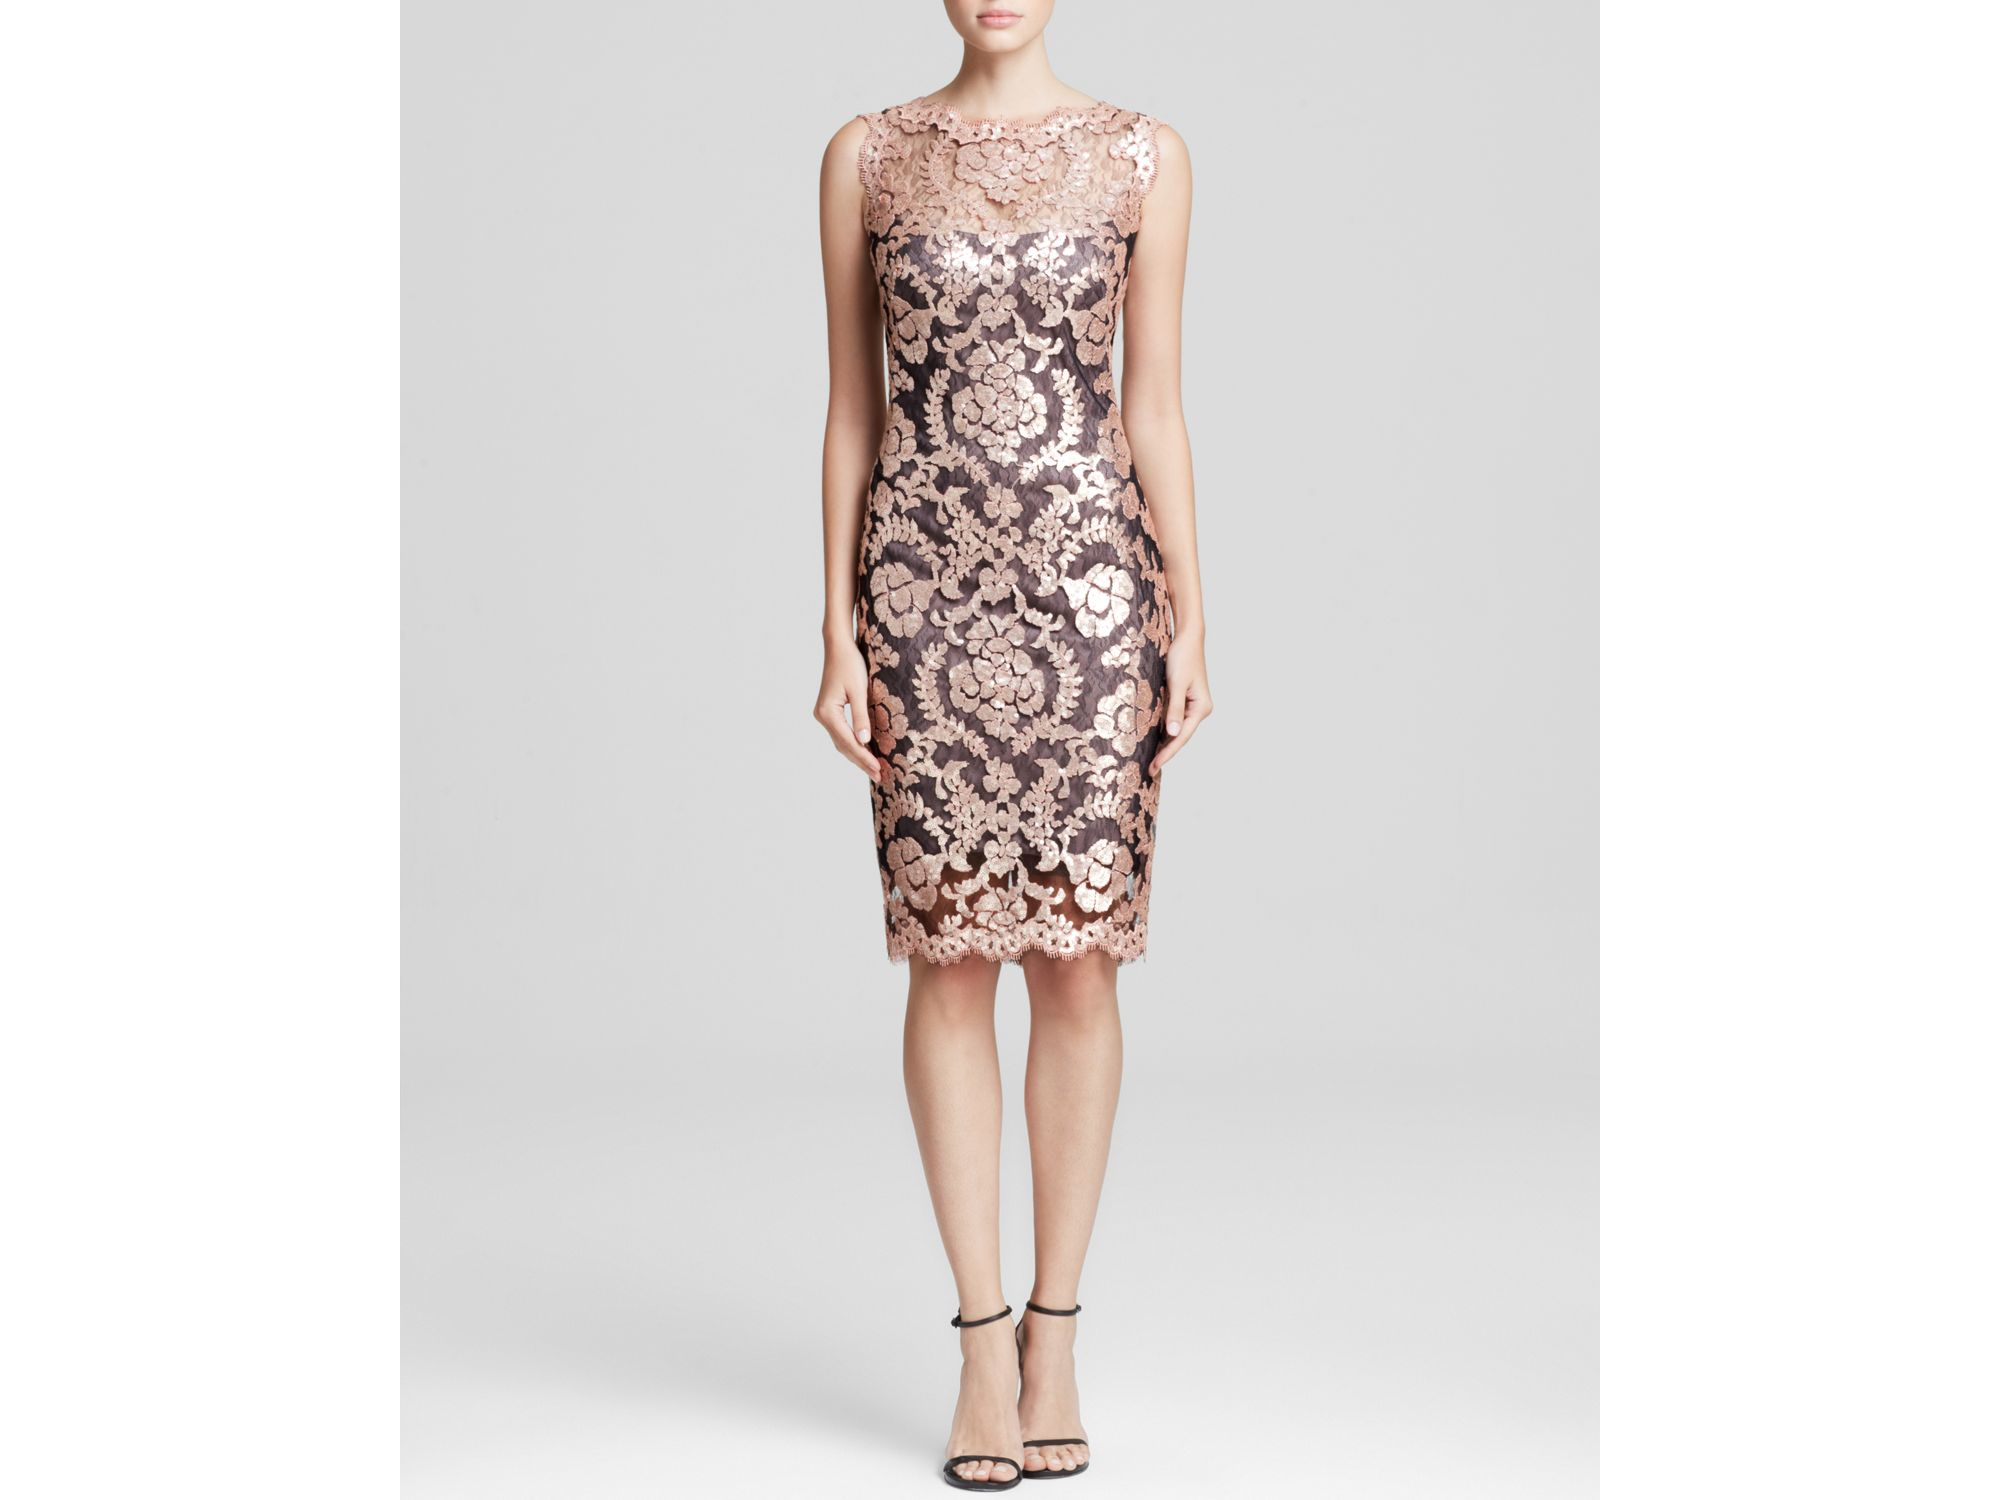 40b02582e4337 Lyst - Tadashi Shoji Petites Sleeveless Sequin Lace Dress in Pink